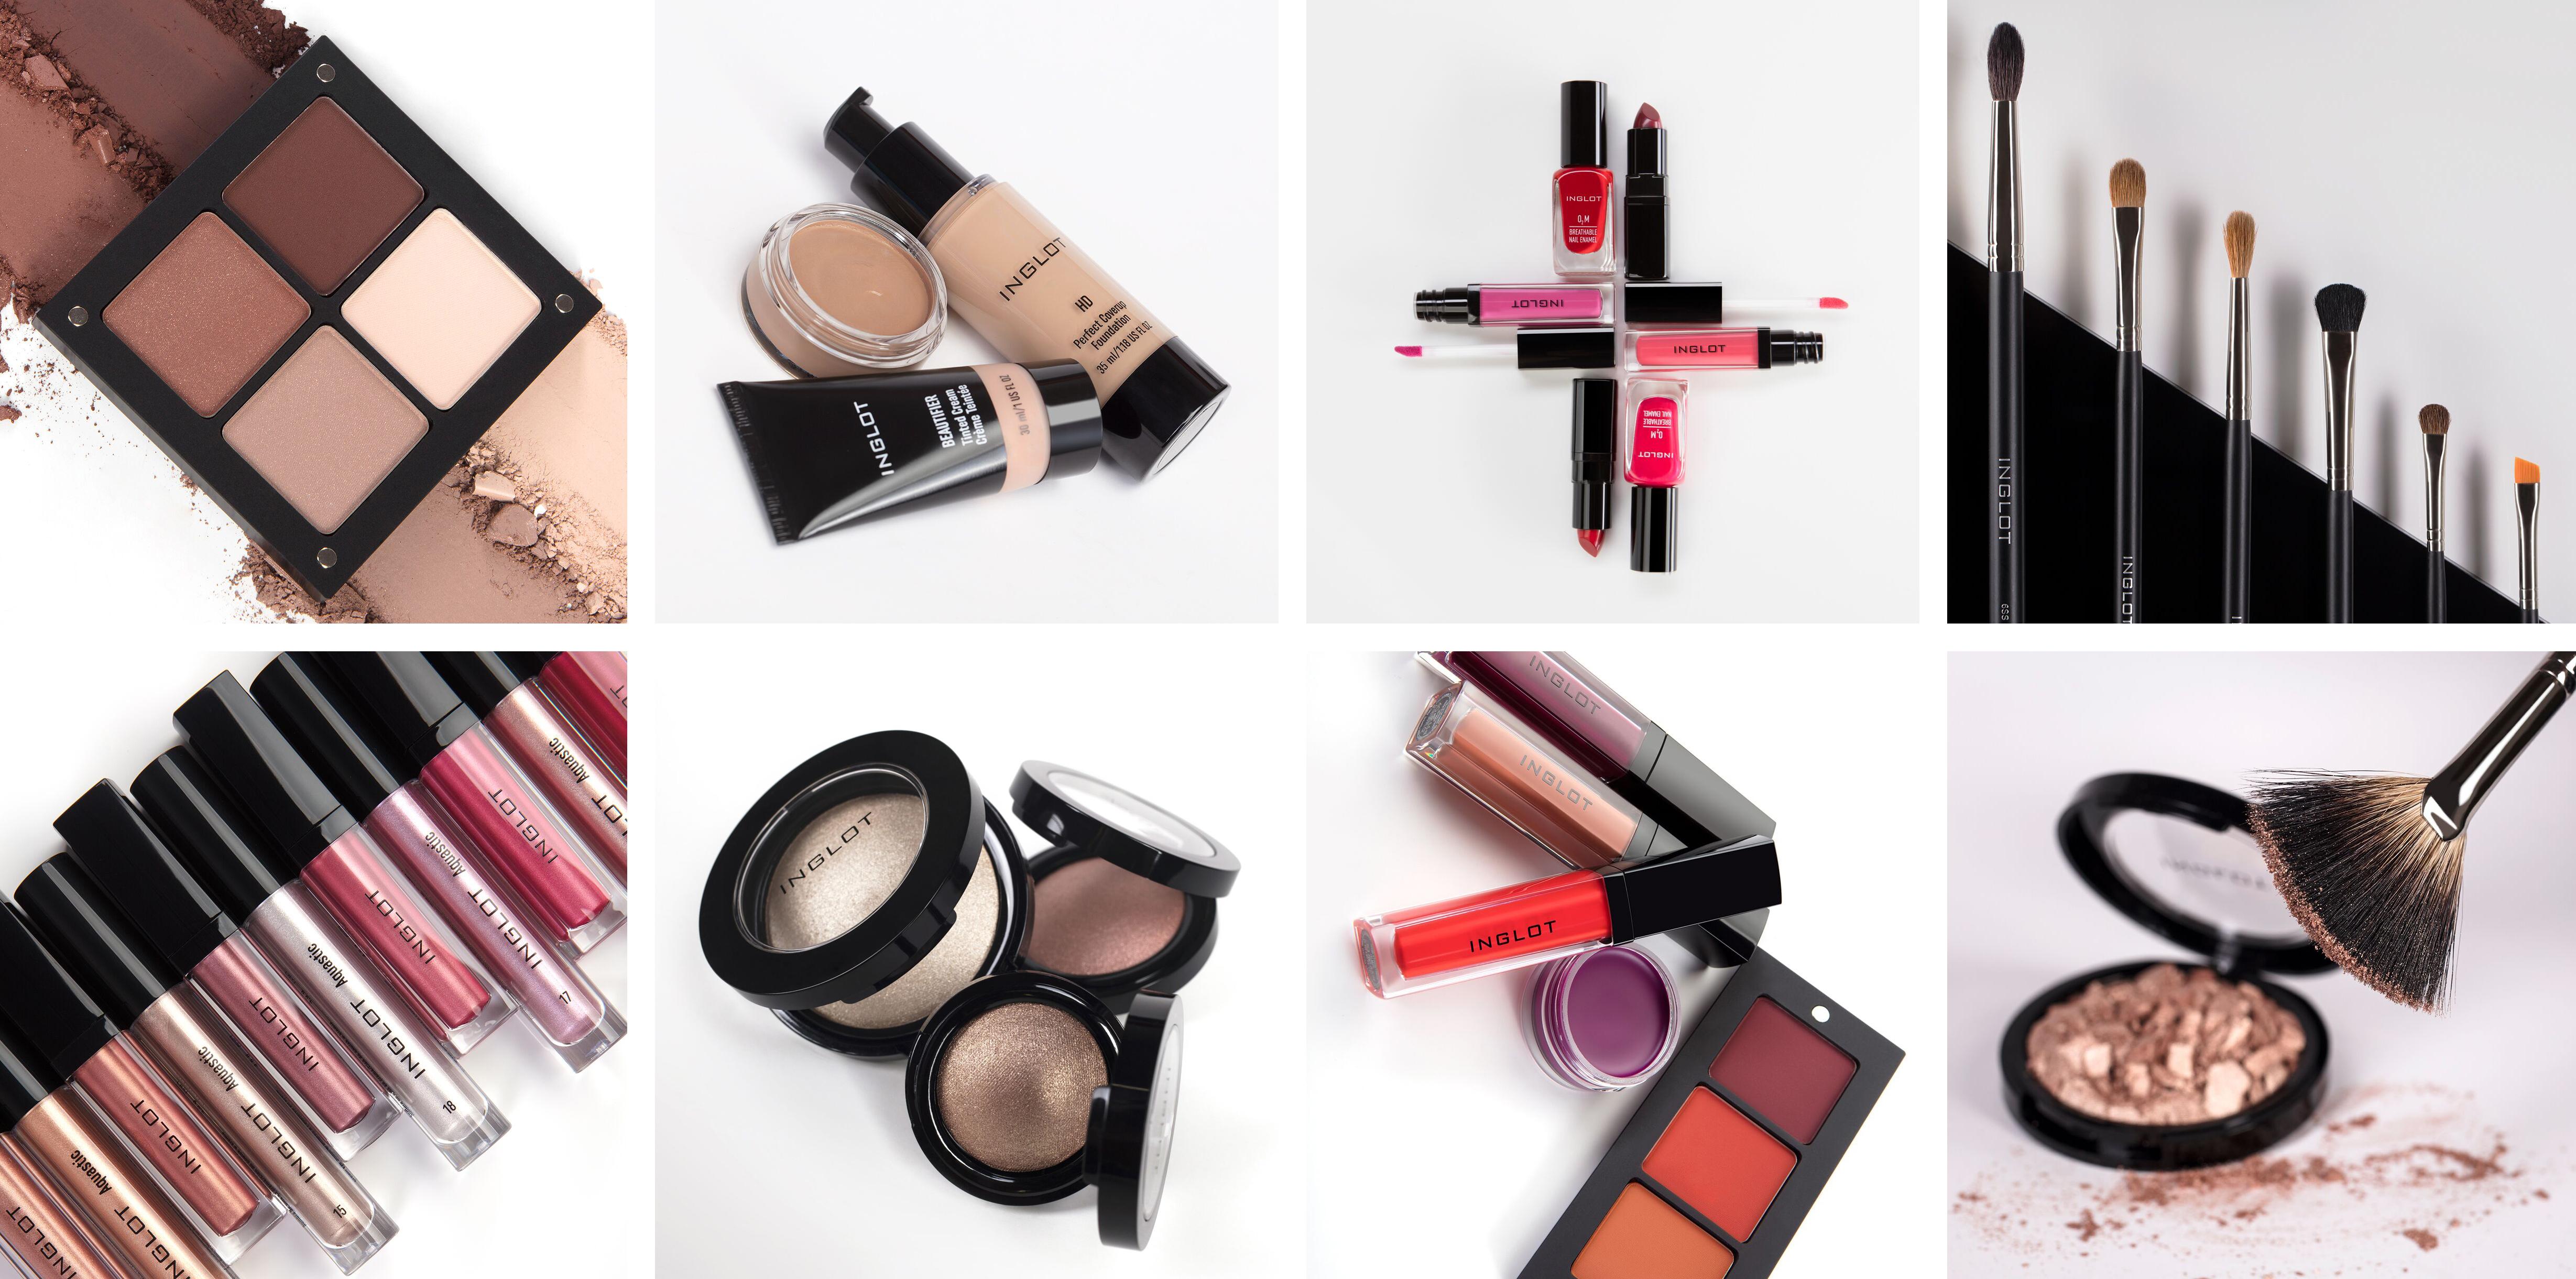 Make-up + Pinsel Inglot - Kosmetikschule Schäfer